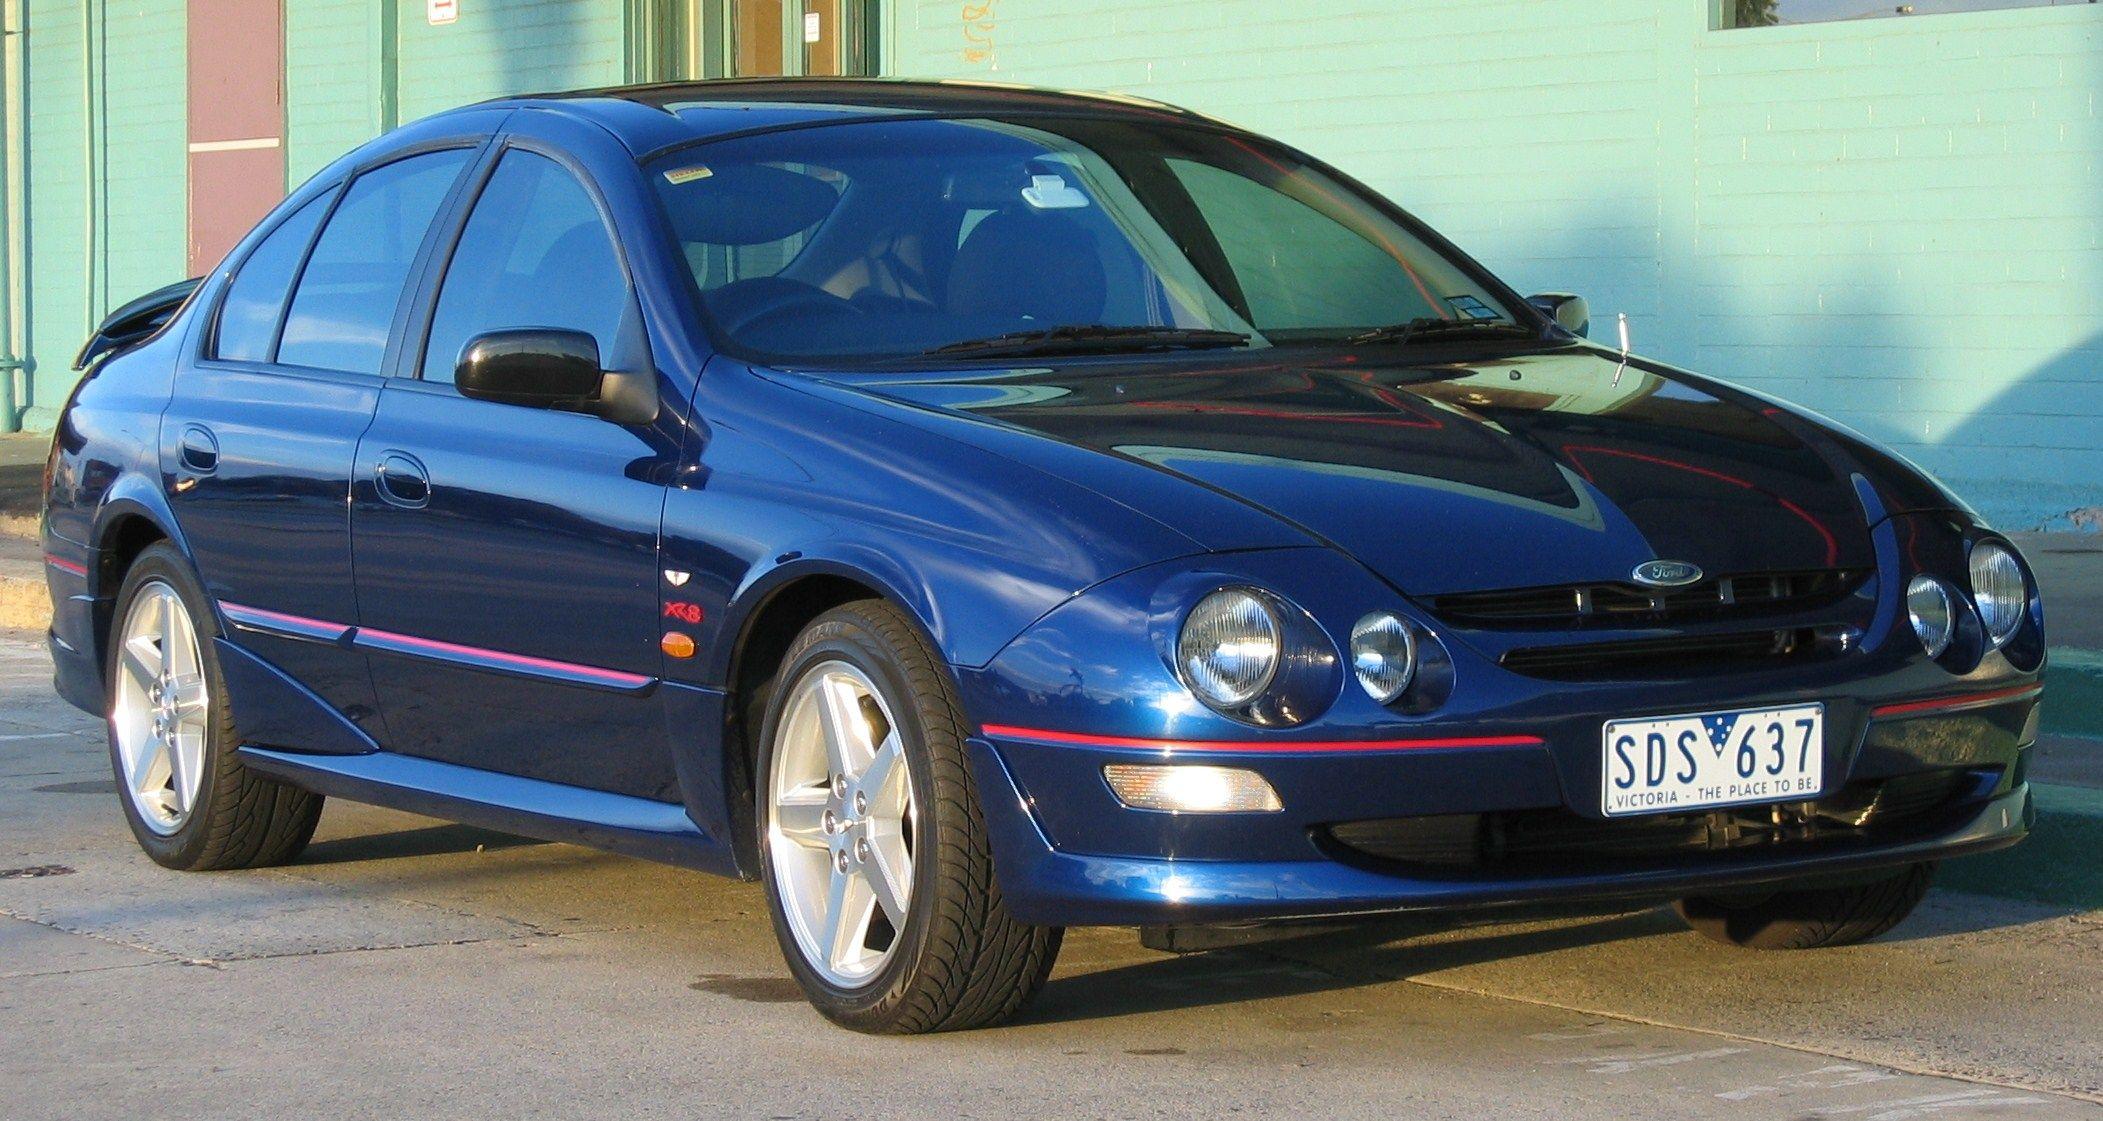 1999 AU Falcon XR8 Ford Falcon Australia Pinterest